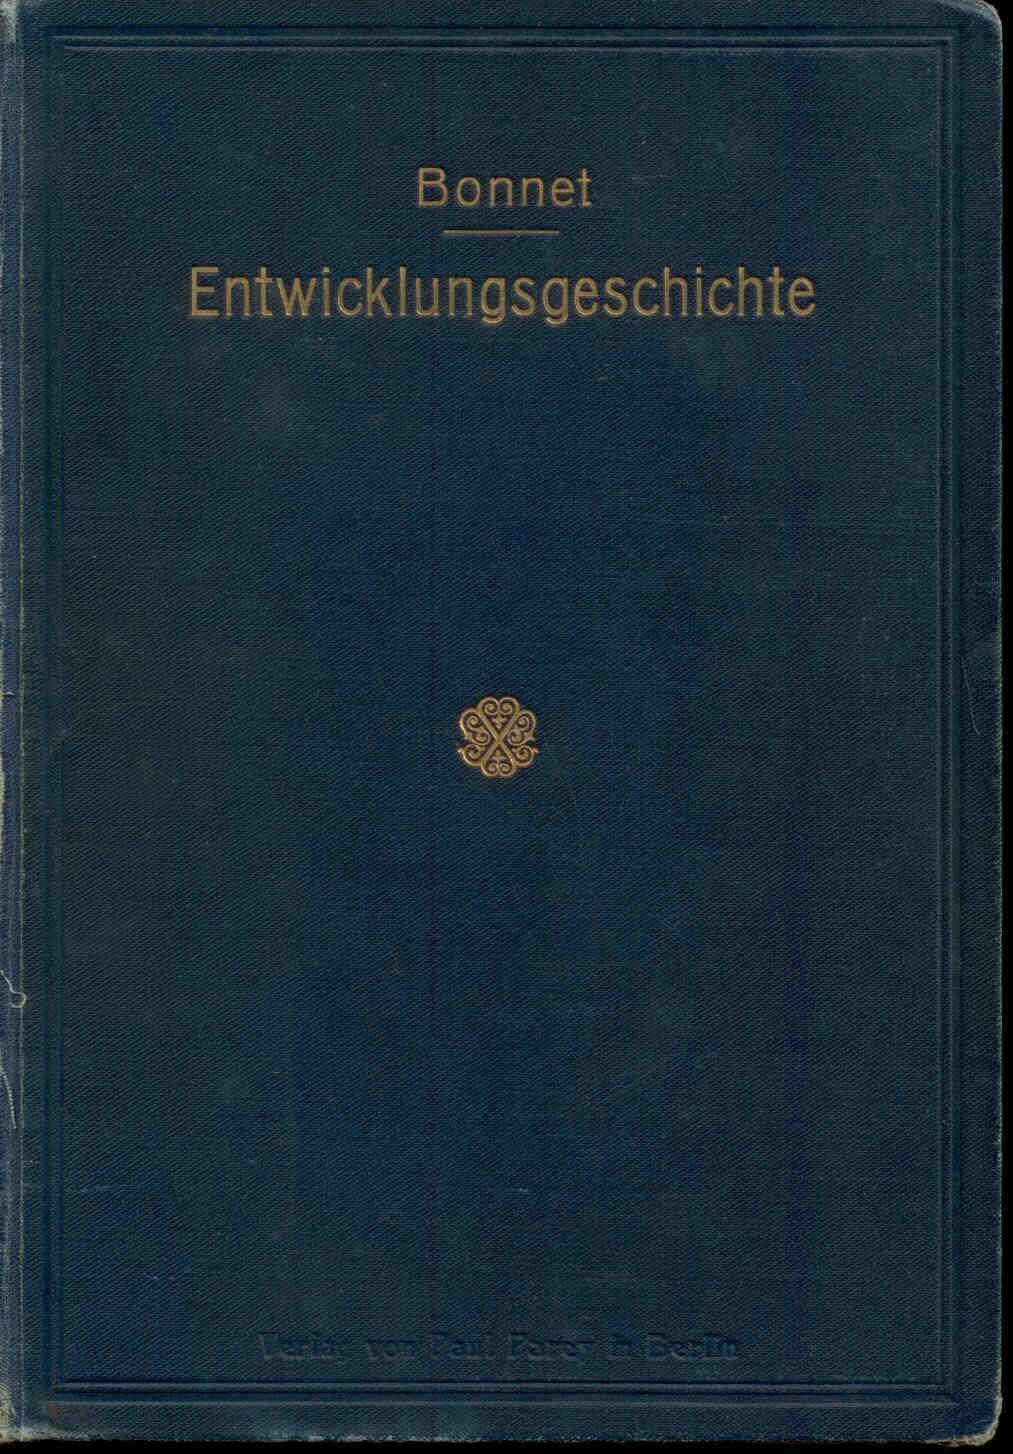 Bonnet, R.: Lehrbuch der Entwicklungsgeschichte.